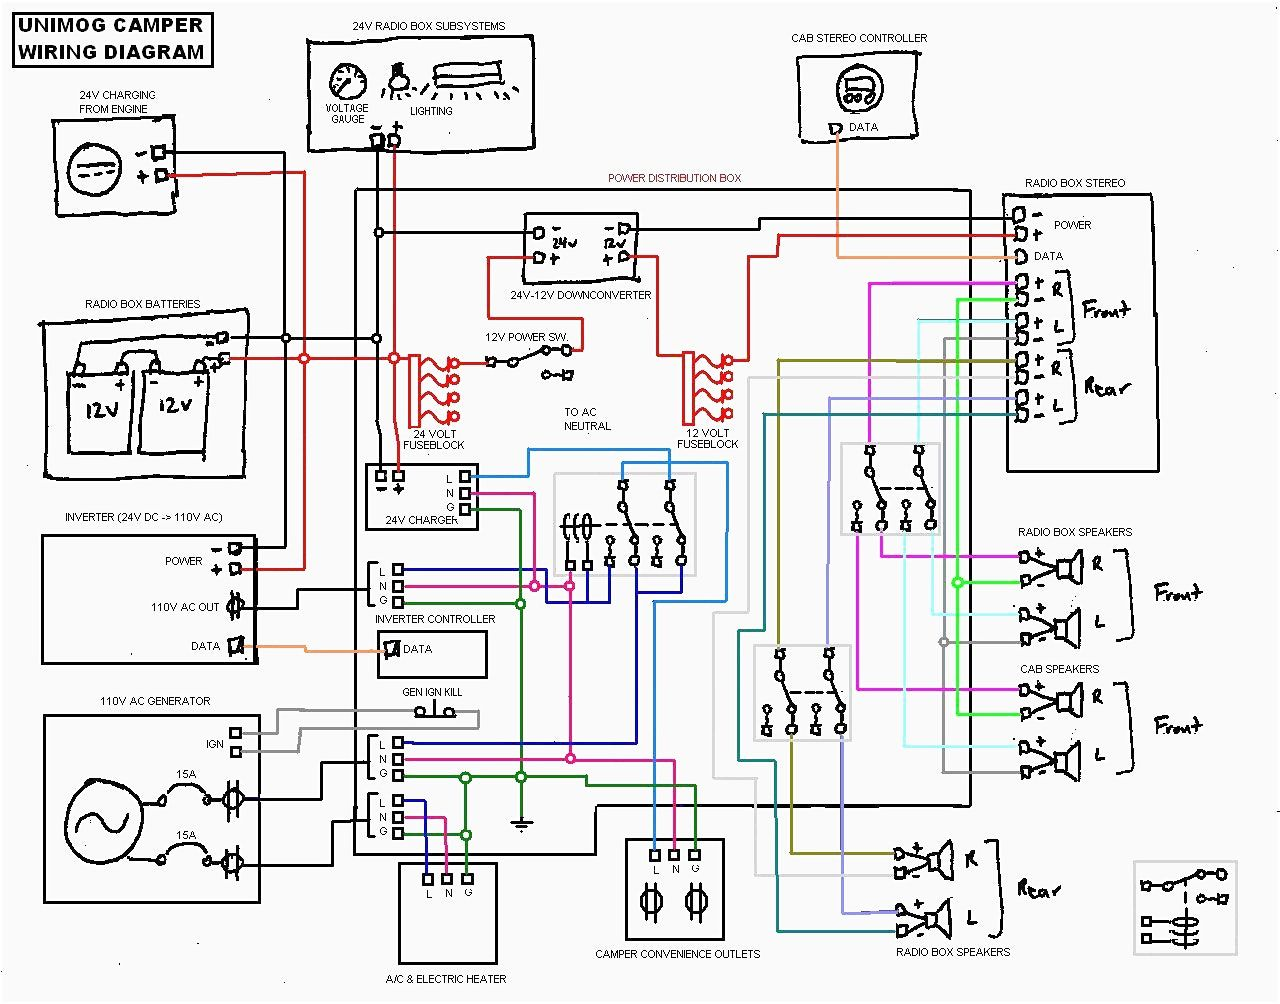 [WLLP_2054]   AD_8291] Generator Wiring Diagrams Also Teardrop Trailer Wiring Diagrams  Free Diagram | Travel Trailer Power Wiring Diagram |  | Bapap Hapolo Mohammedshrine Librar Wiring 101